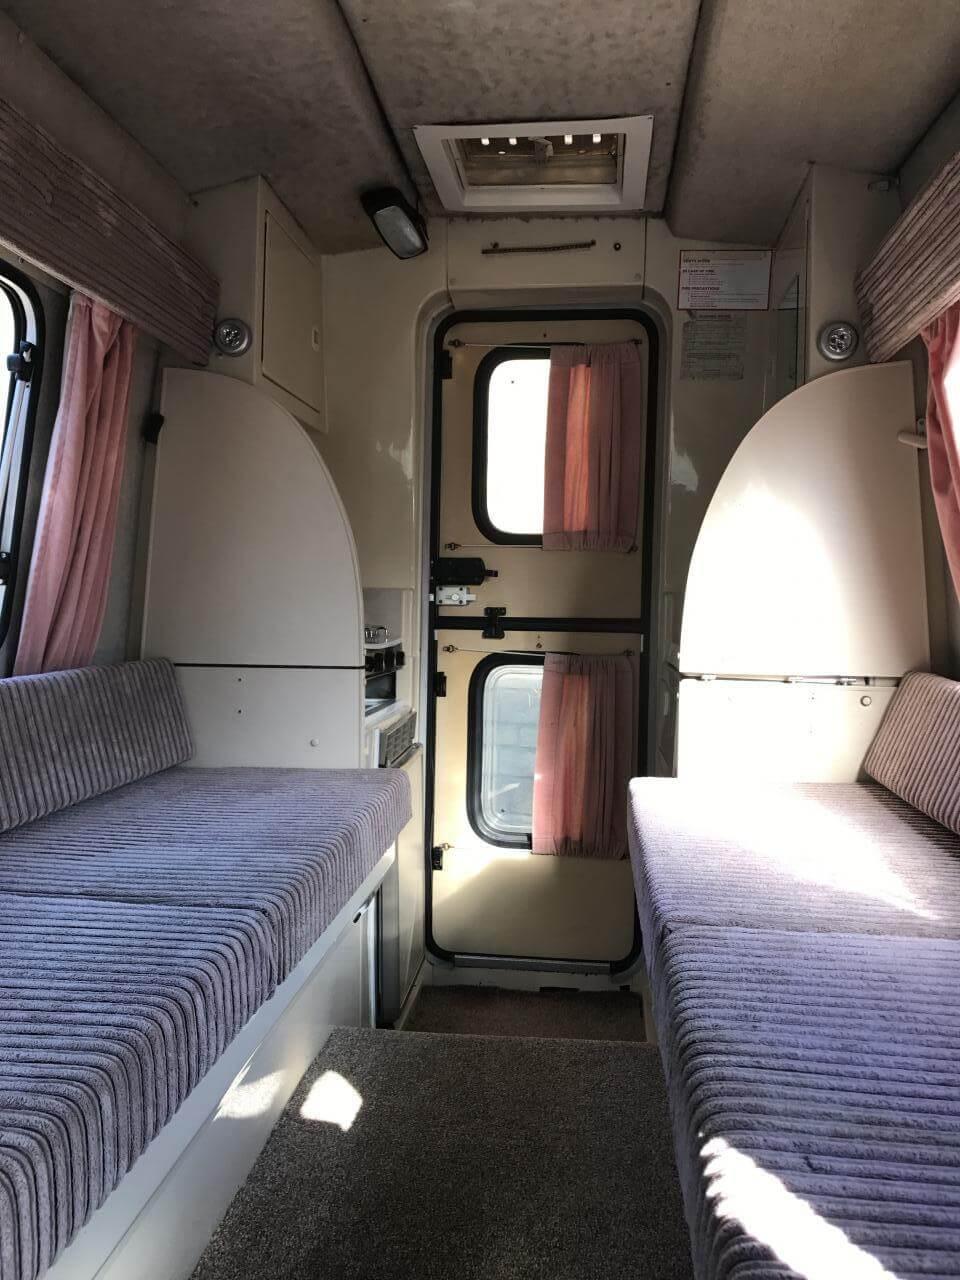 1991 Romahome Citroen C15 Camper